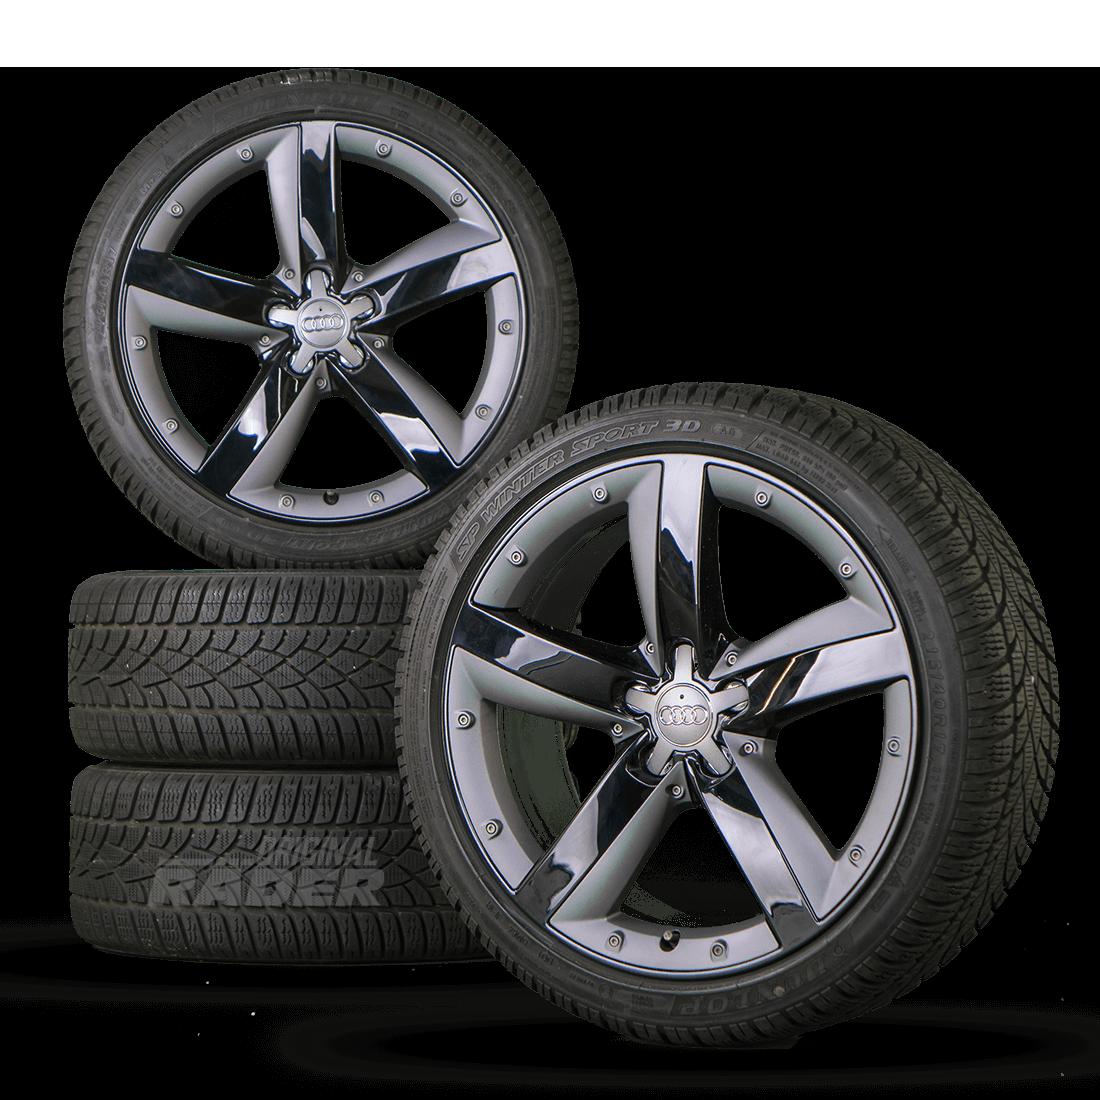 Original Audi Felgen Und Komplettrader Gunstig Online Kaufen In 2020 Felgen Alufelgen Audi